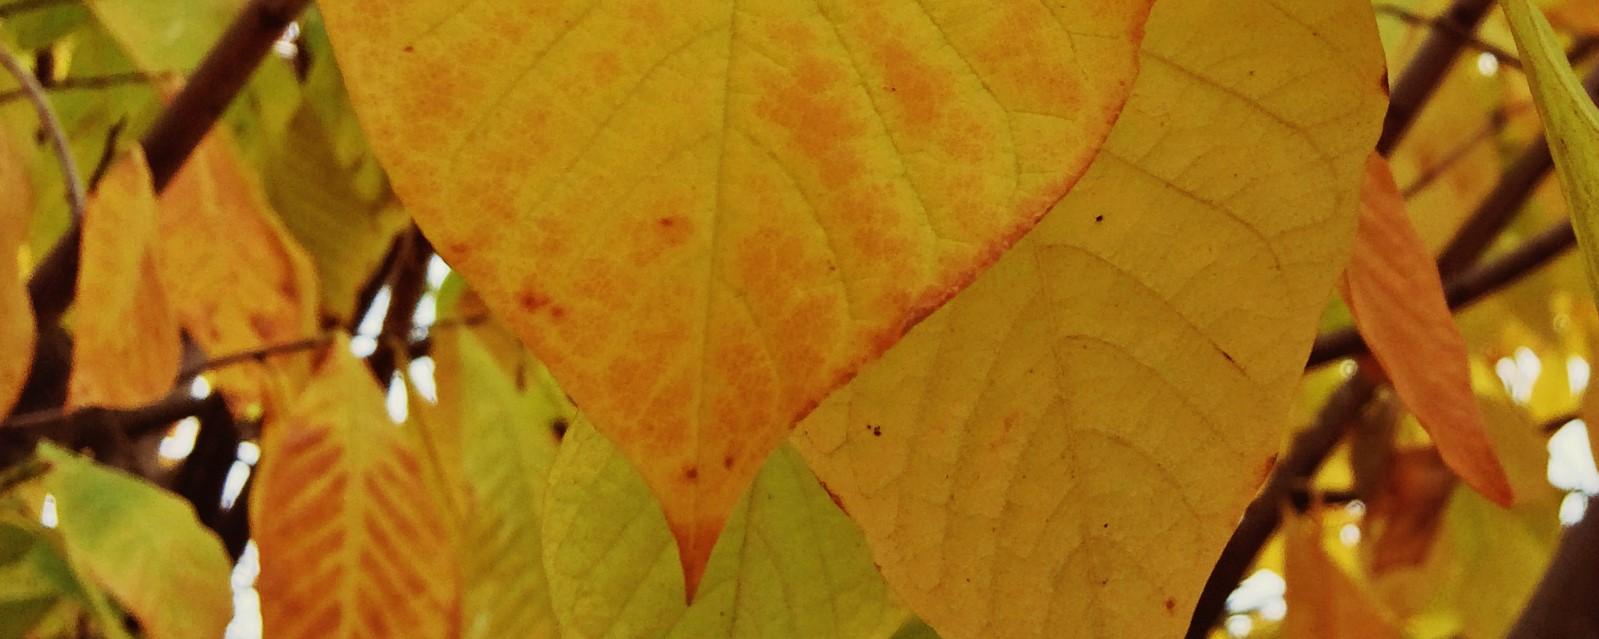 Misc-autumn pawpaw foliage 2.jpg